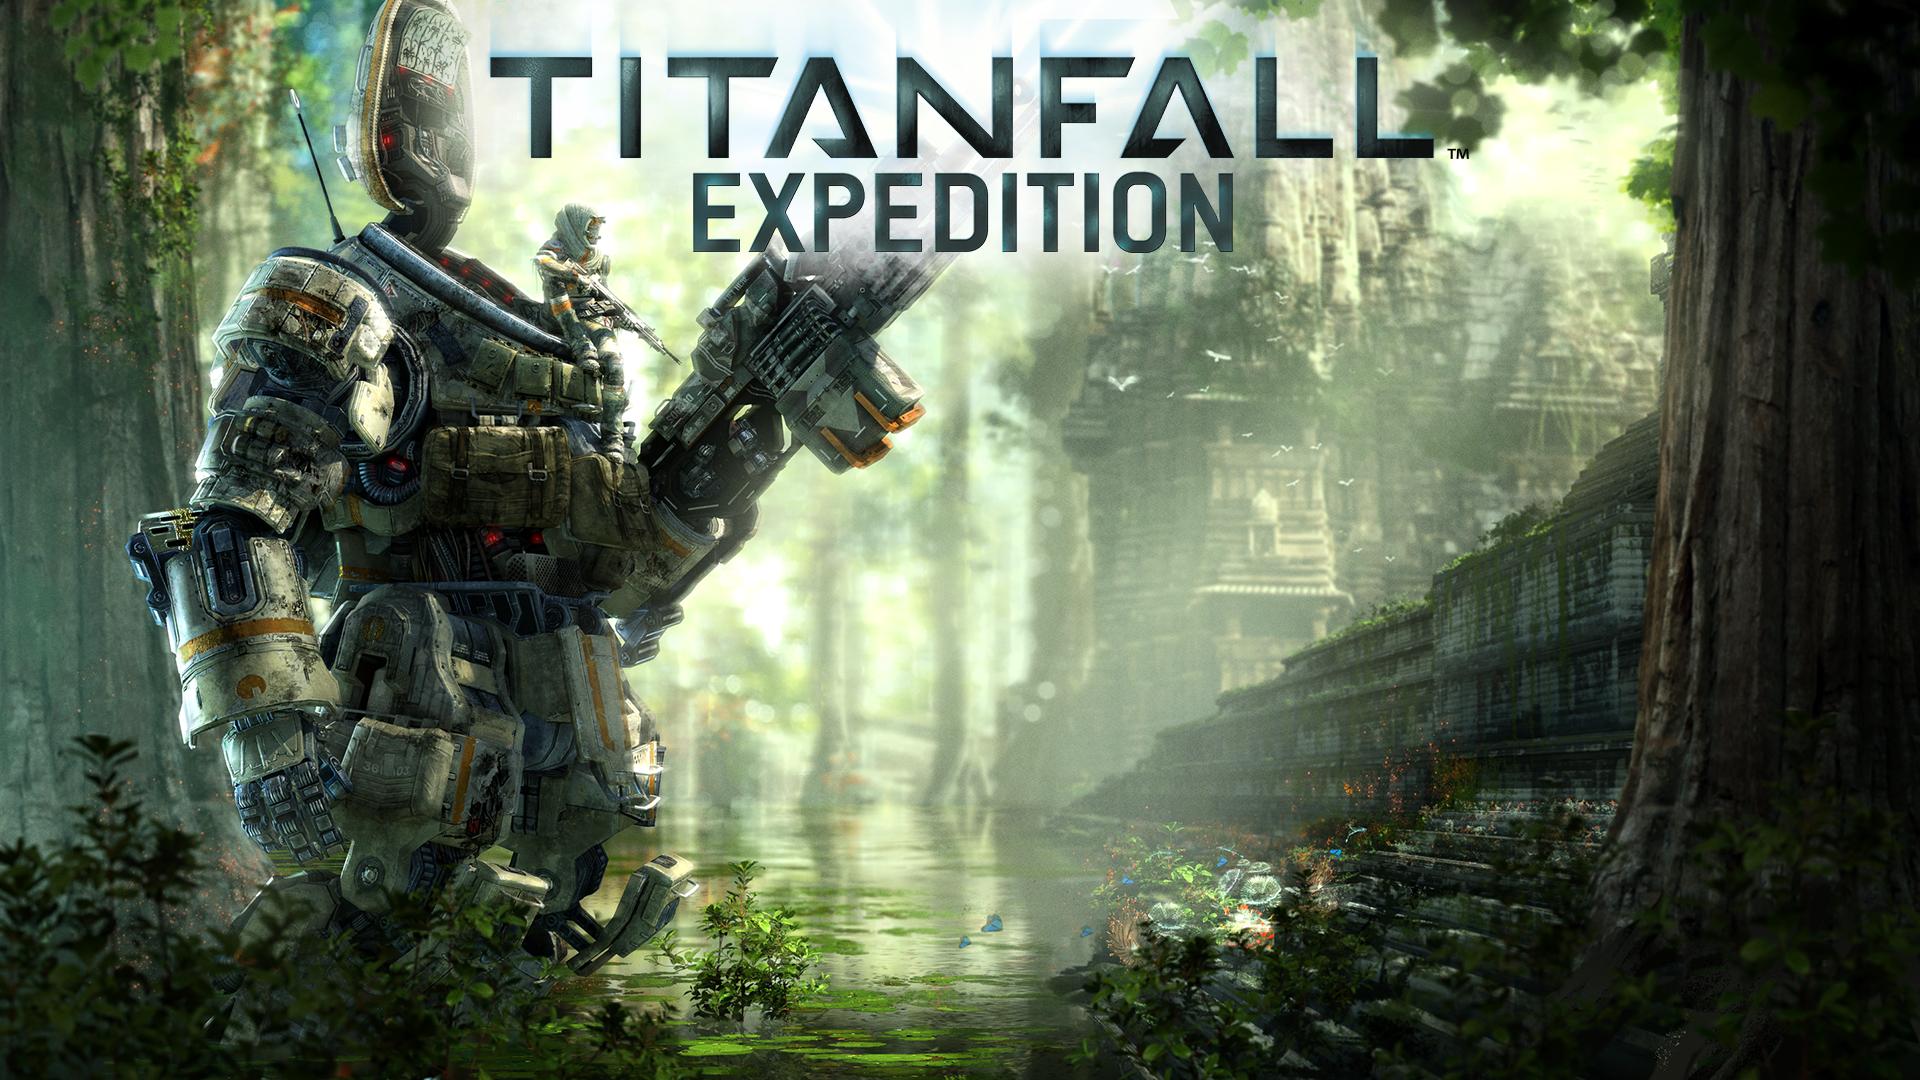 TitanfallExpeditionArt